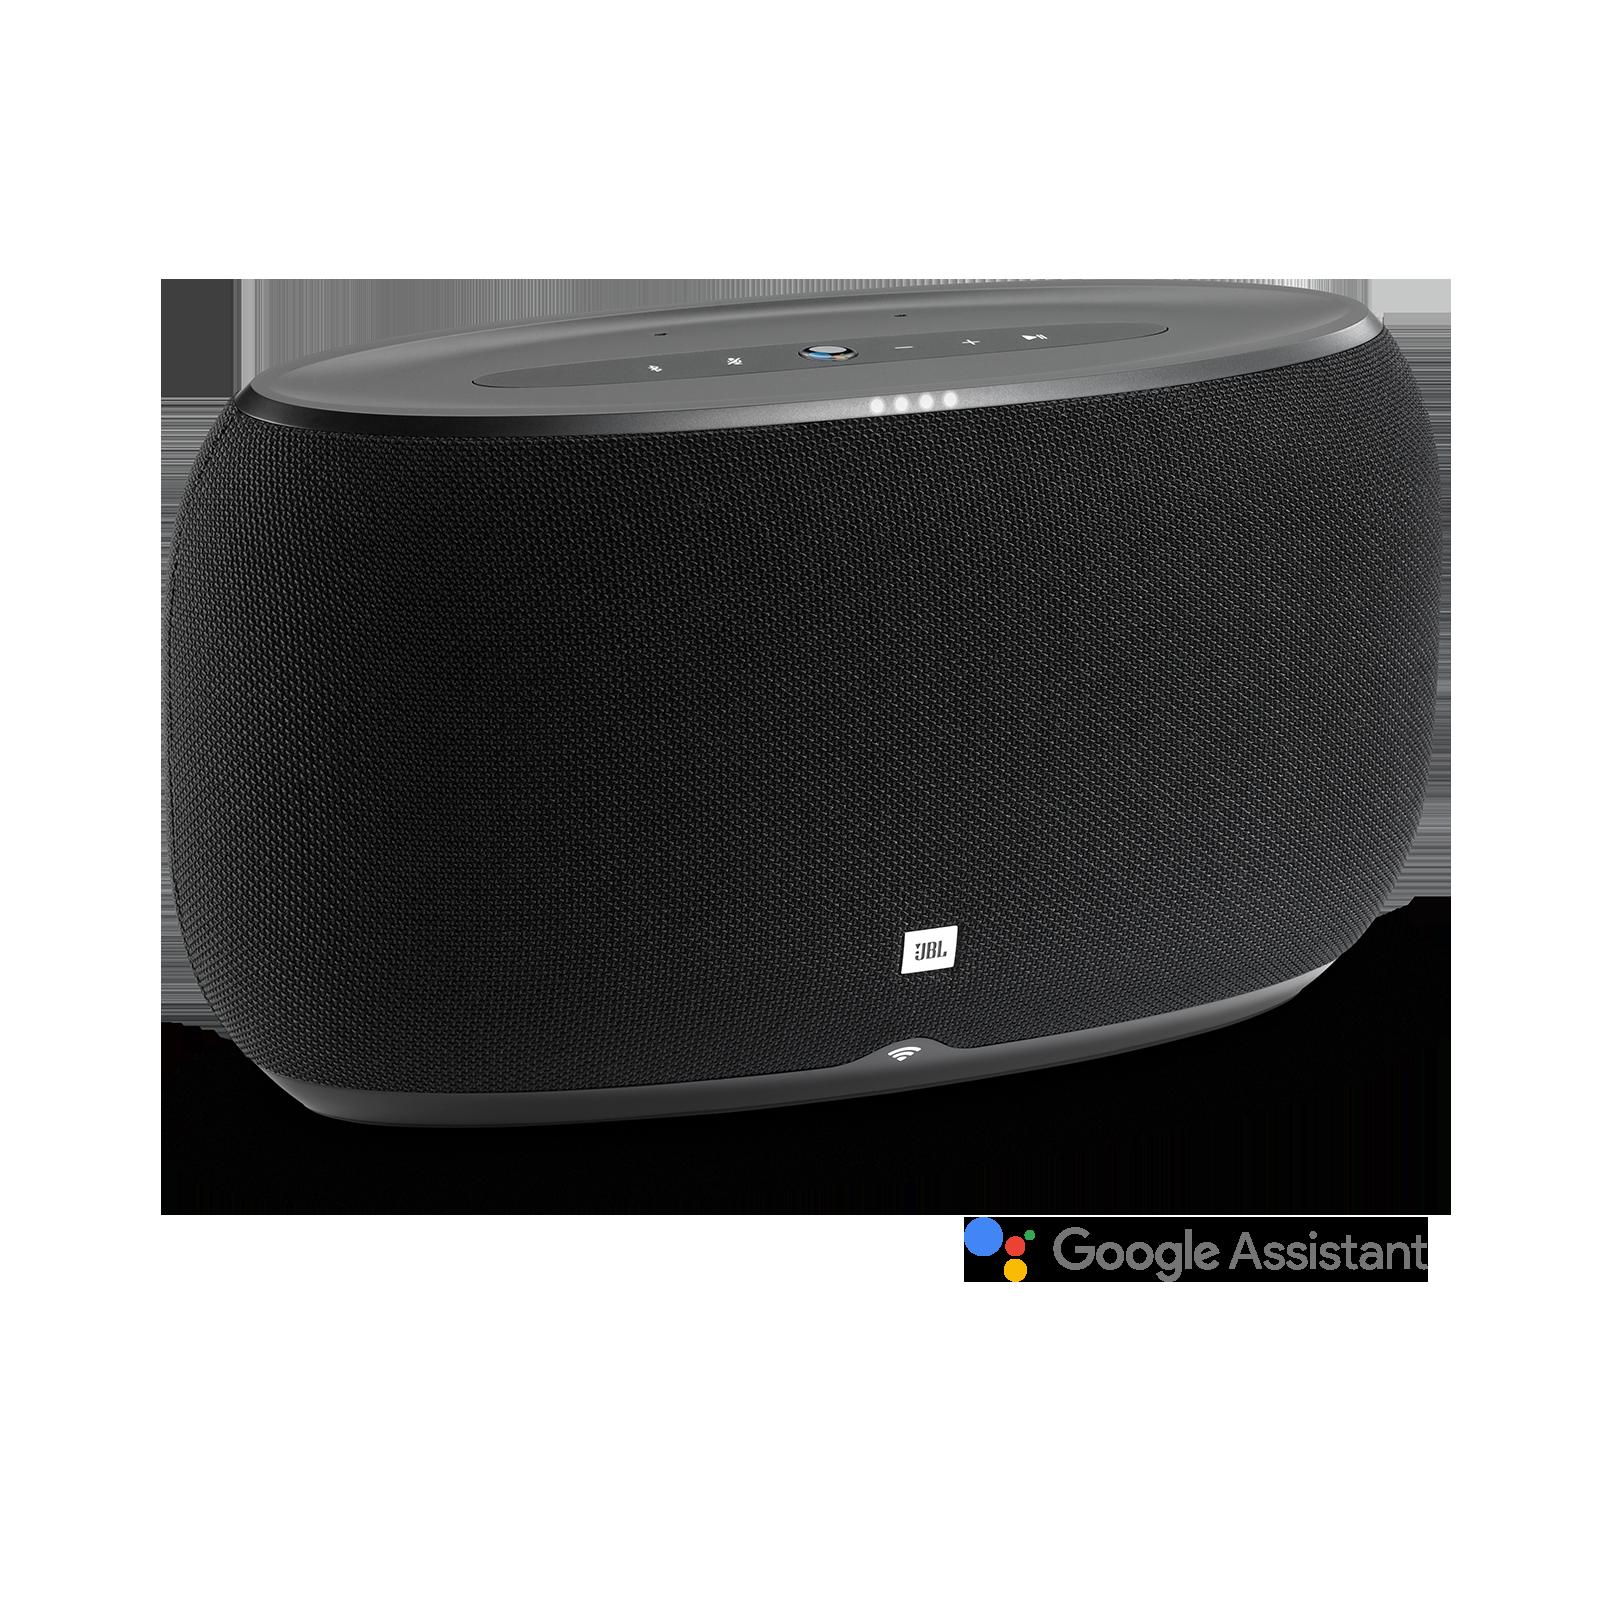 woofer front speakers loudspeakers premium in dvhamaster with b arena jbl ceiling rt wallloudspeaker